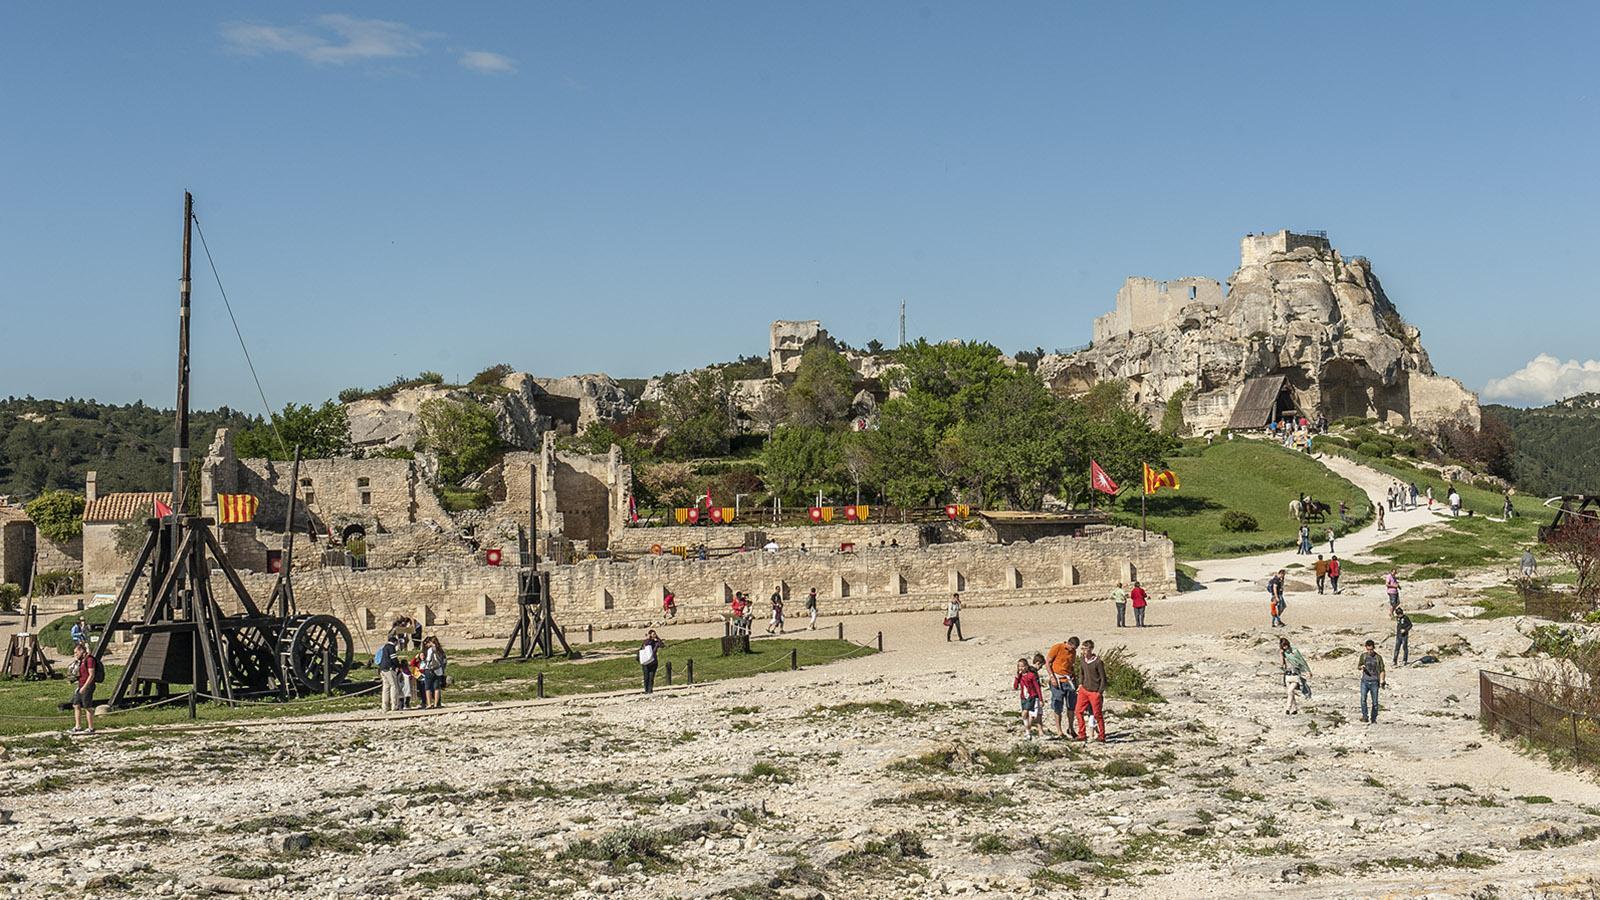 Les Baux-de-Provence: Die Burg ist die größte Ruine Frankreichs. Foto: Hilke Maunder